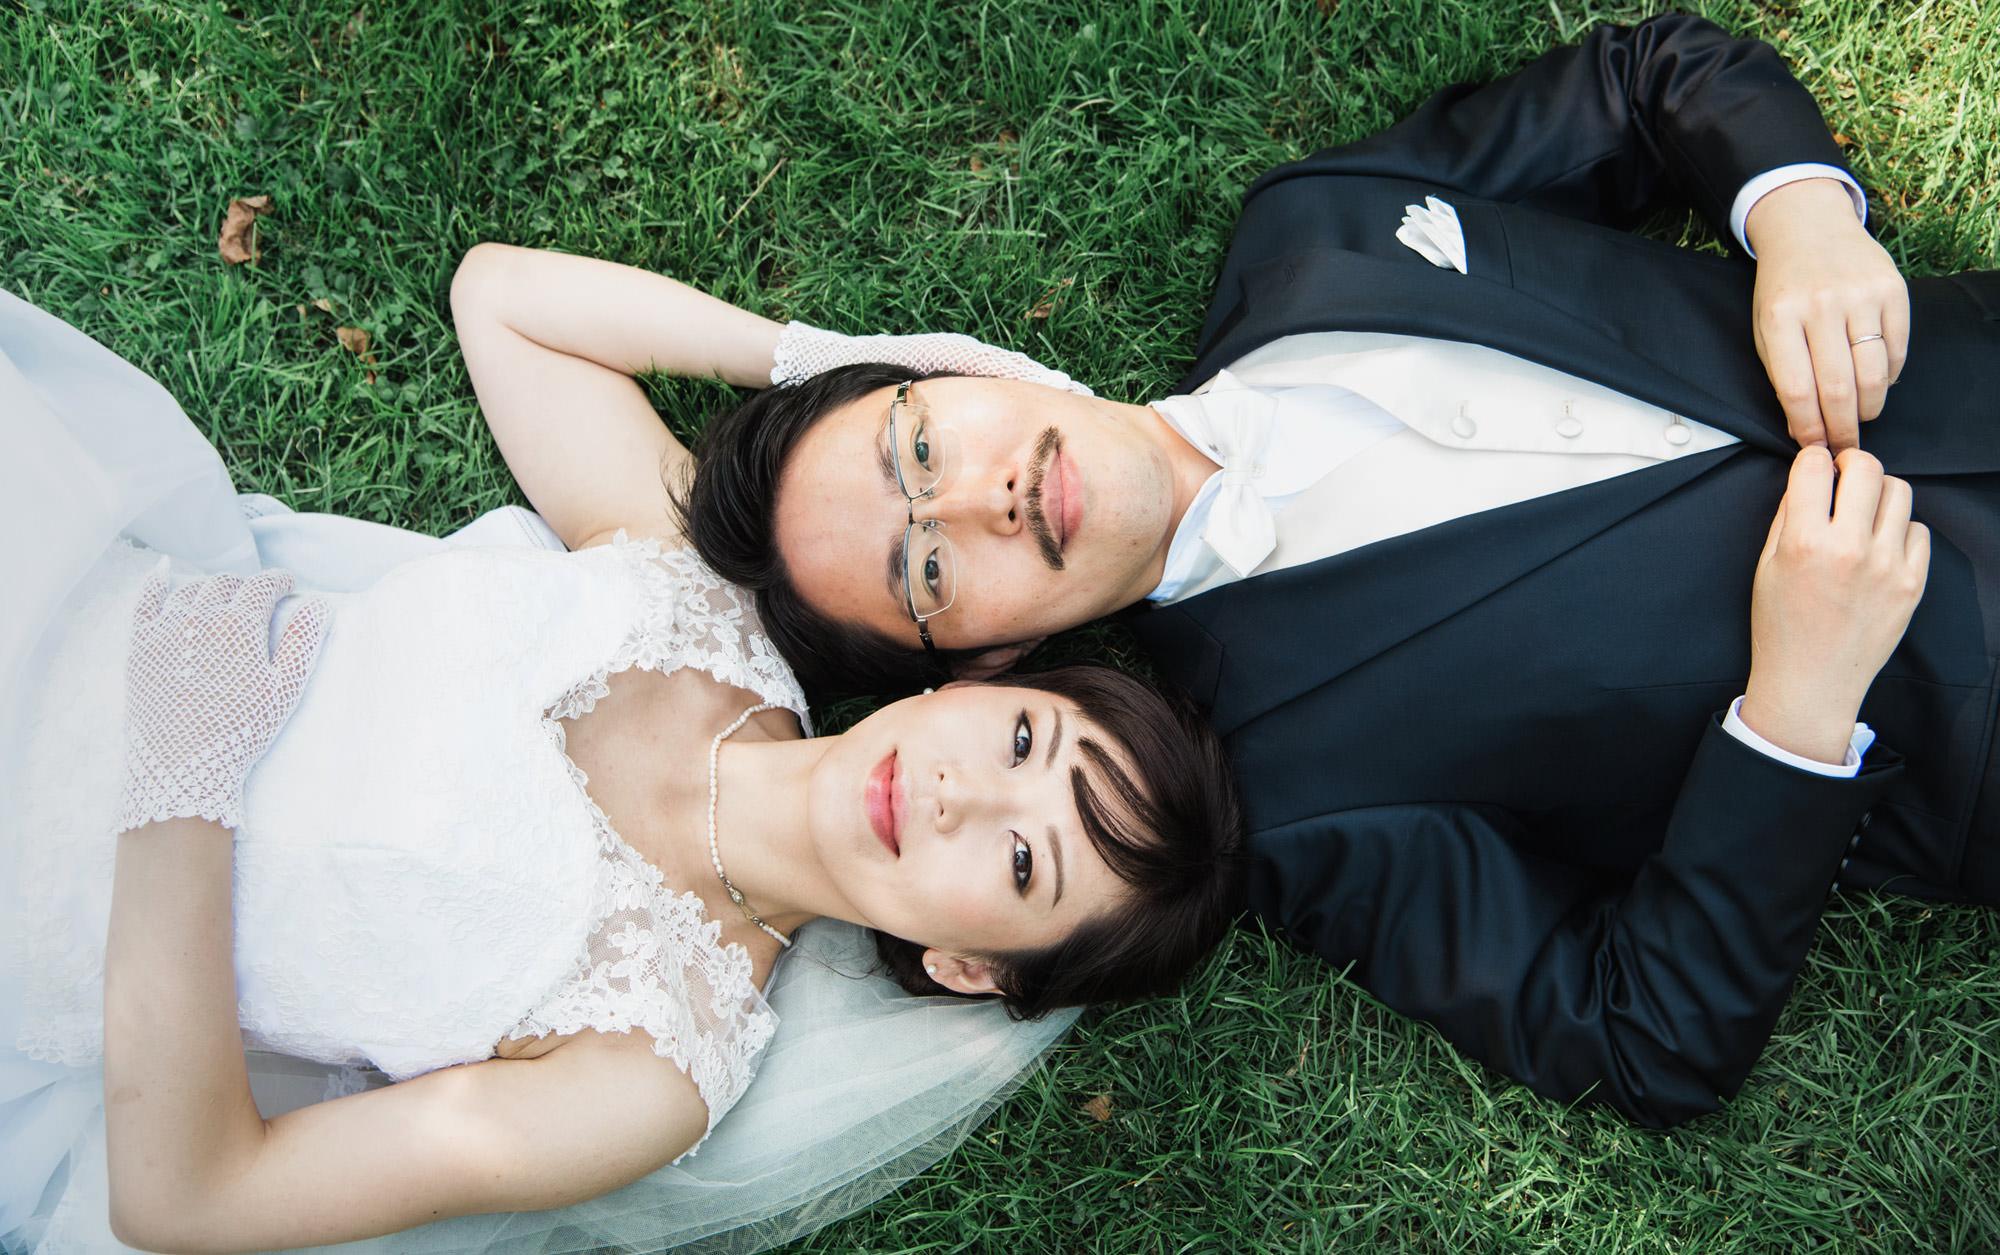 hyde-park-pre-wedding-phtooshoot-japanese-couple